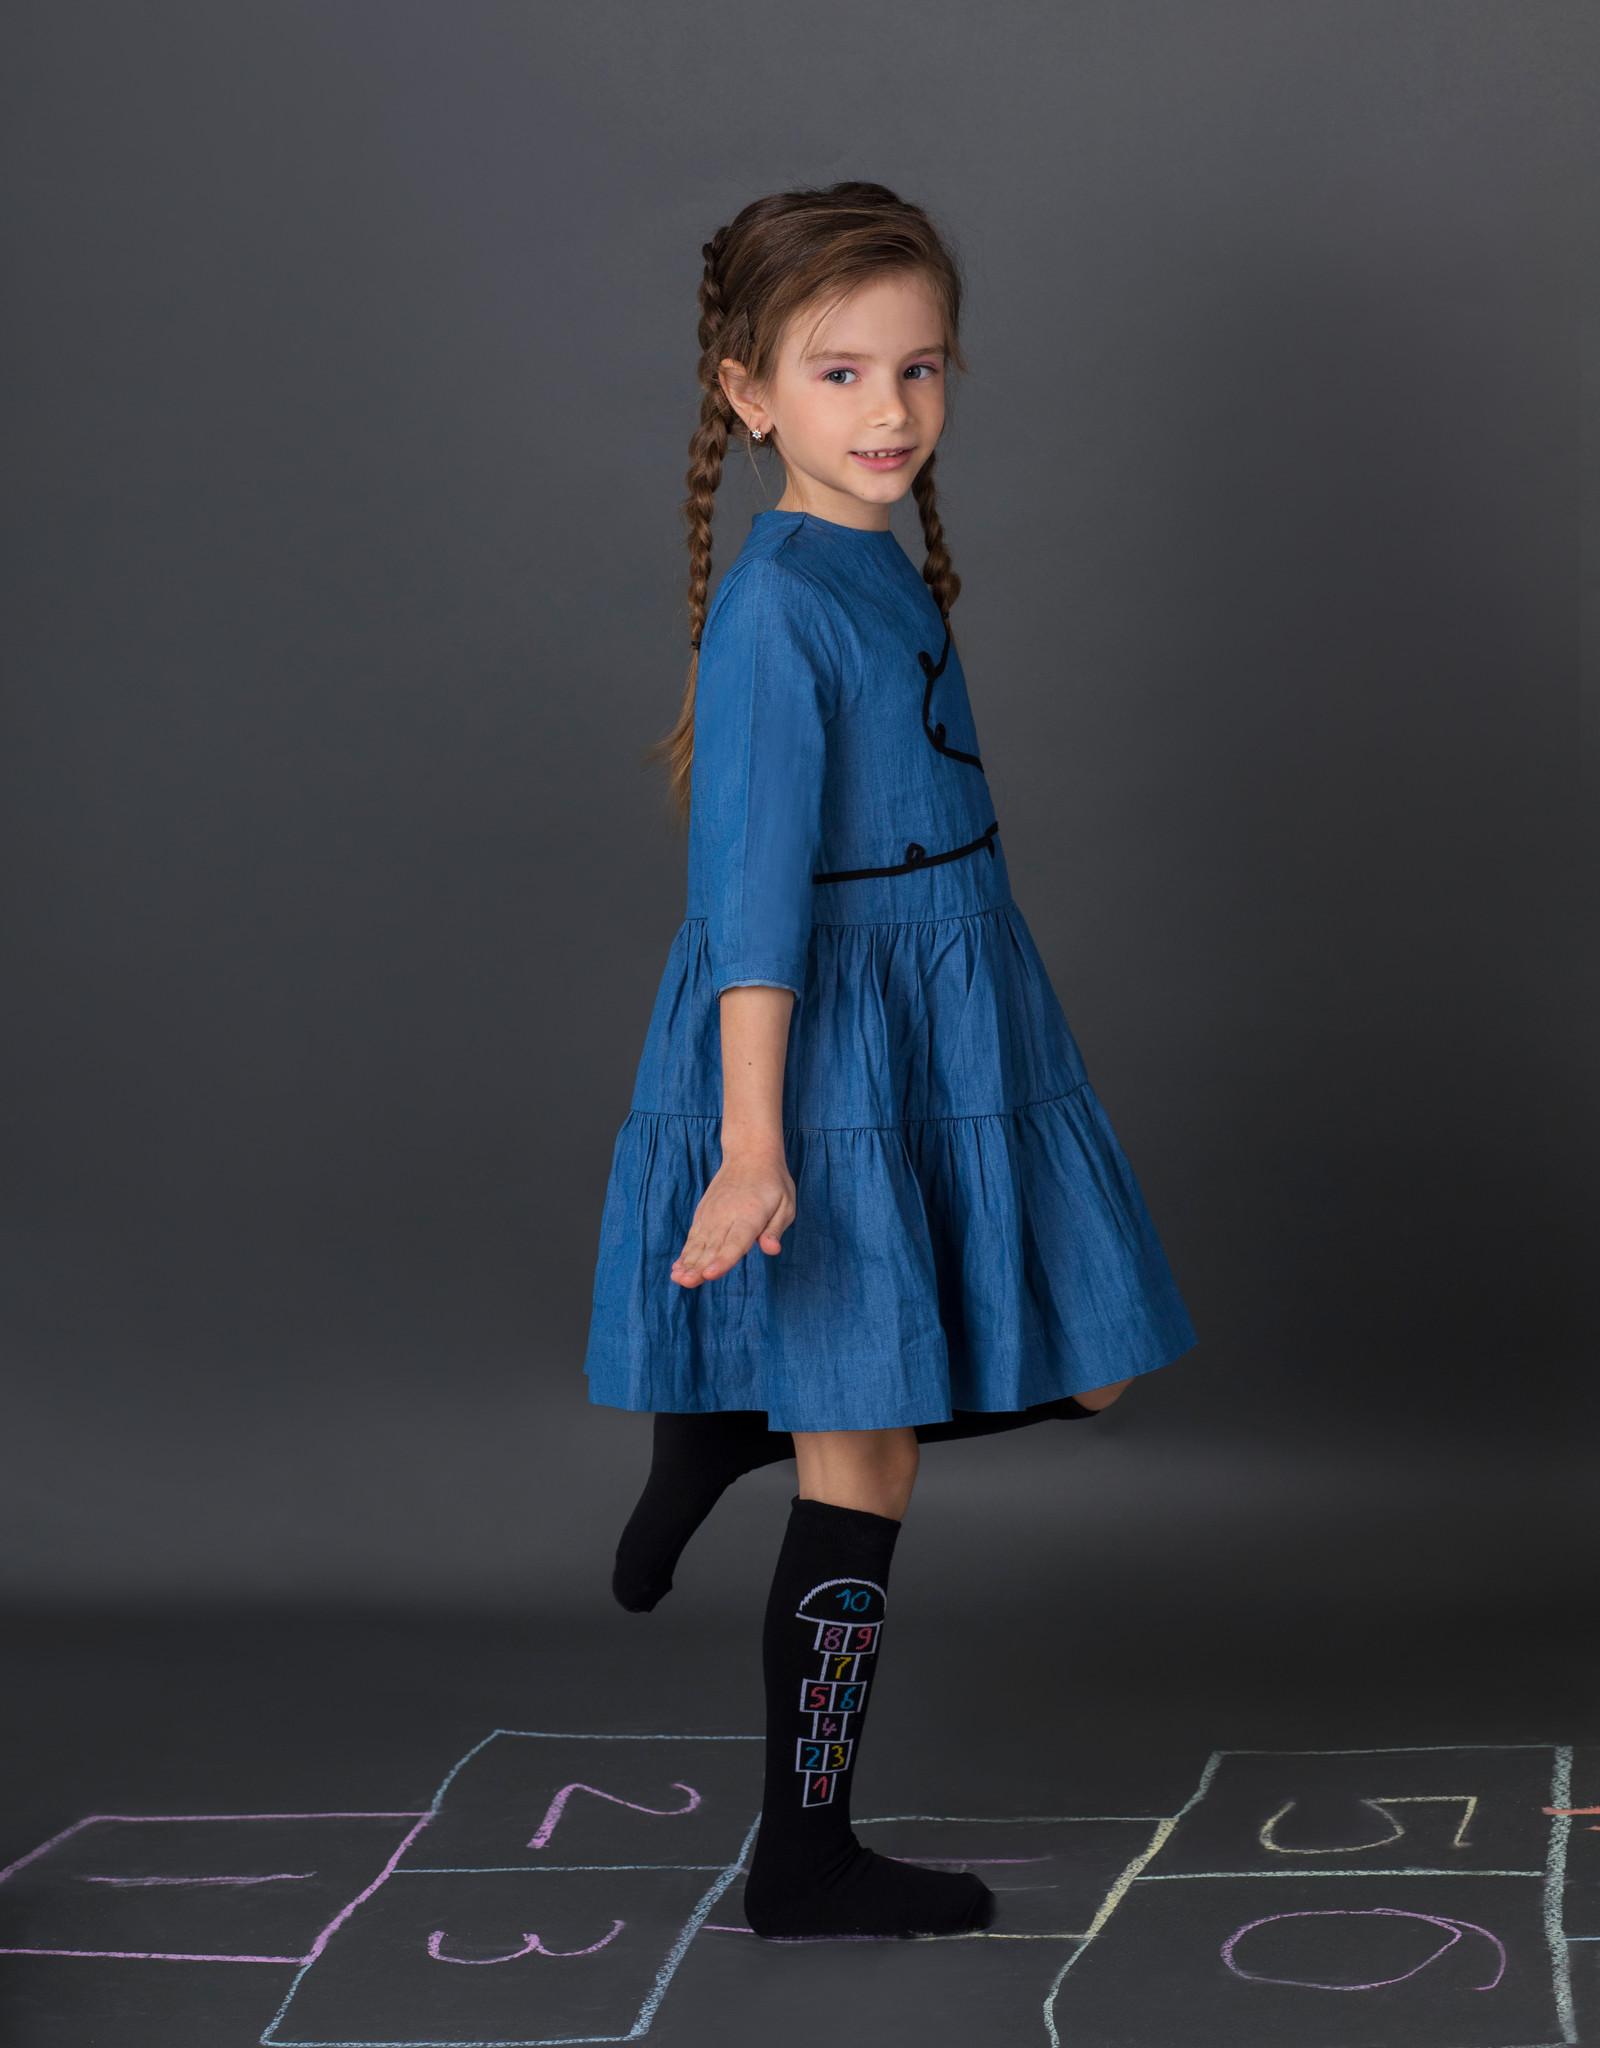 Blinq Blinq Hopscotch Knee Sock